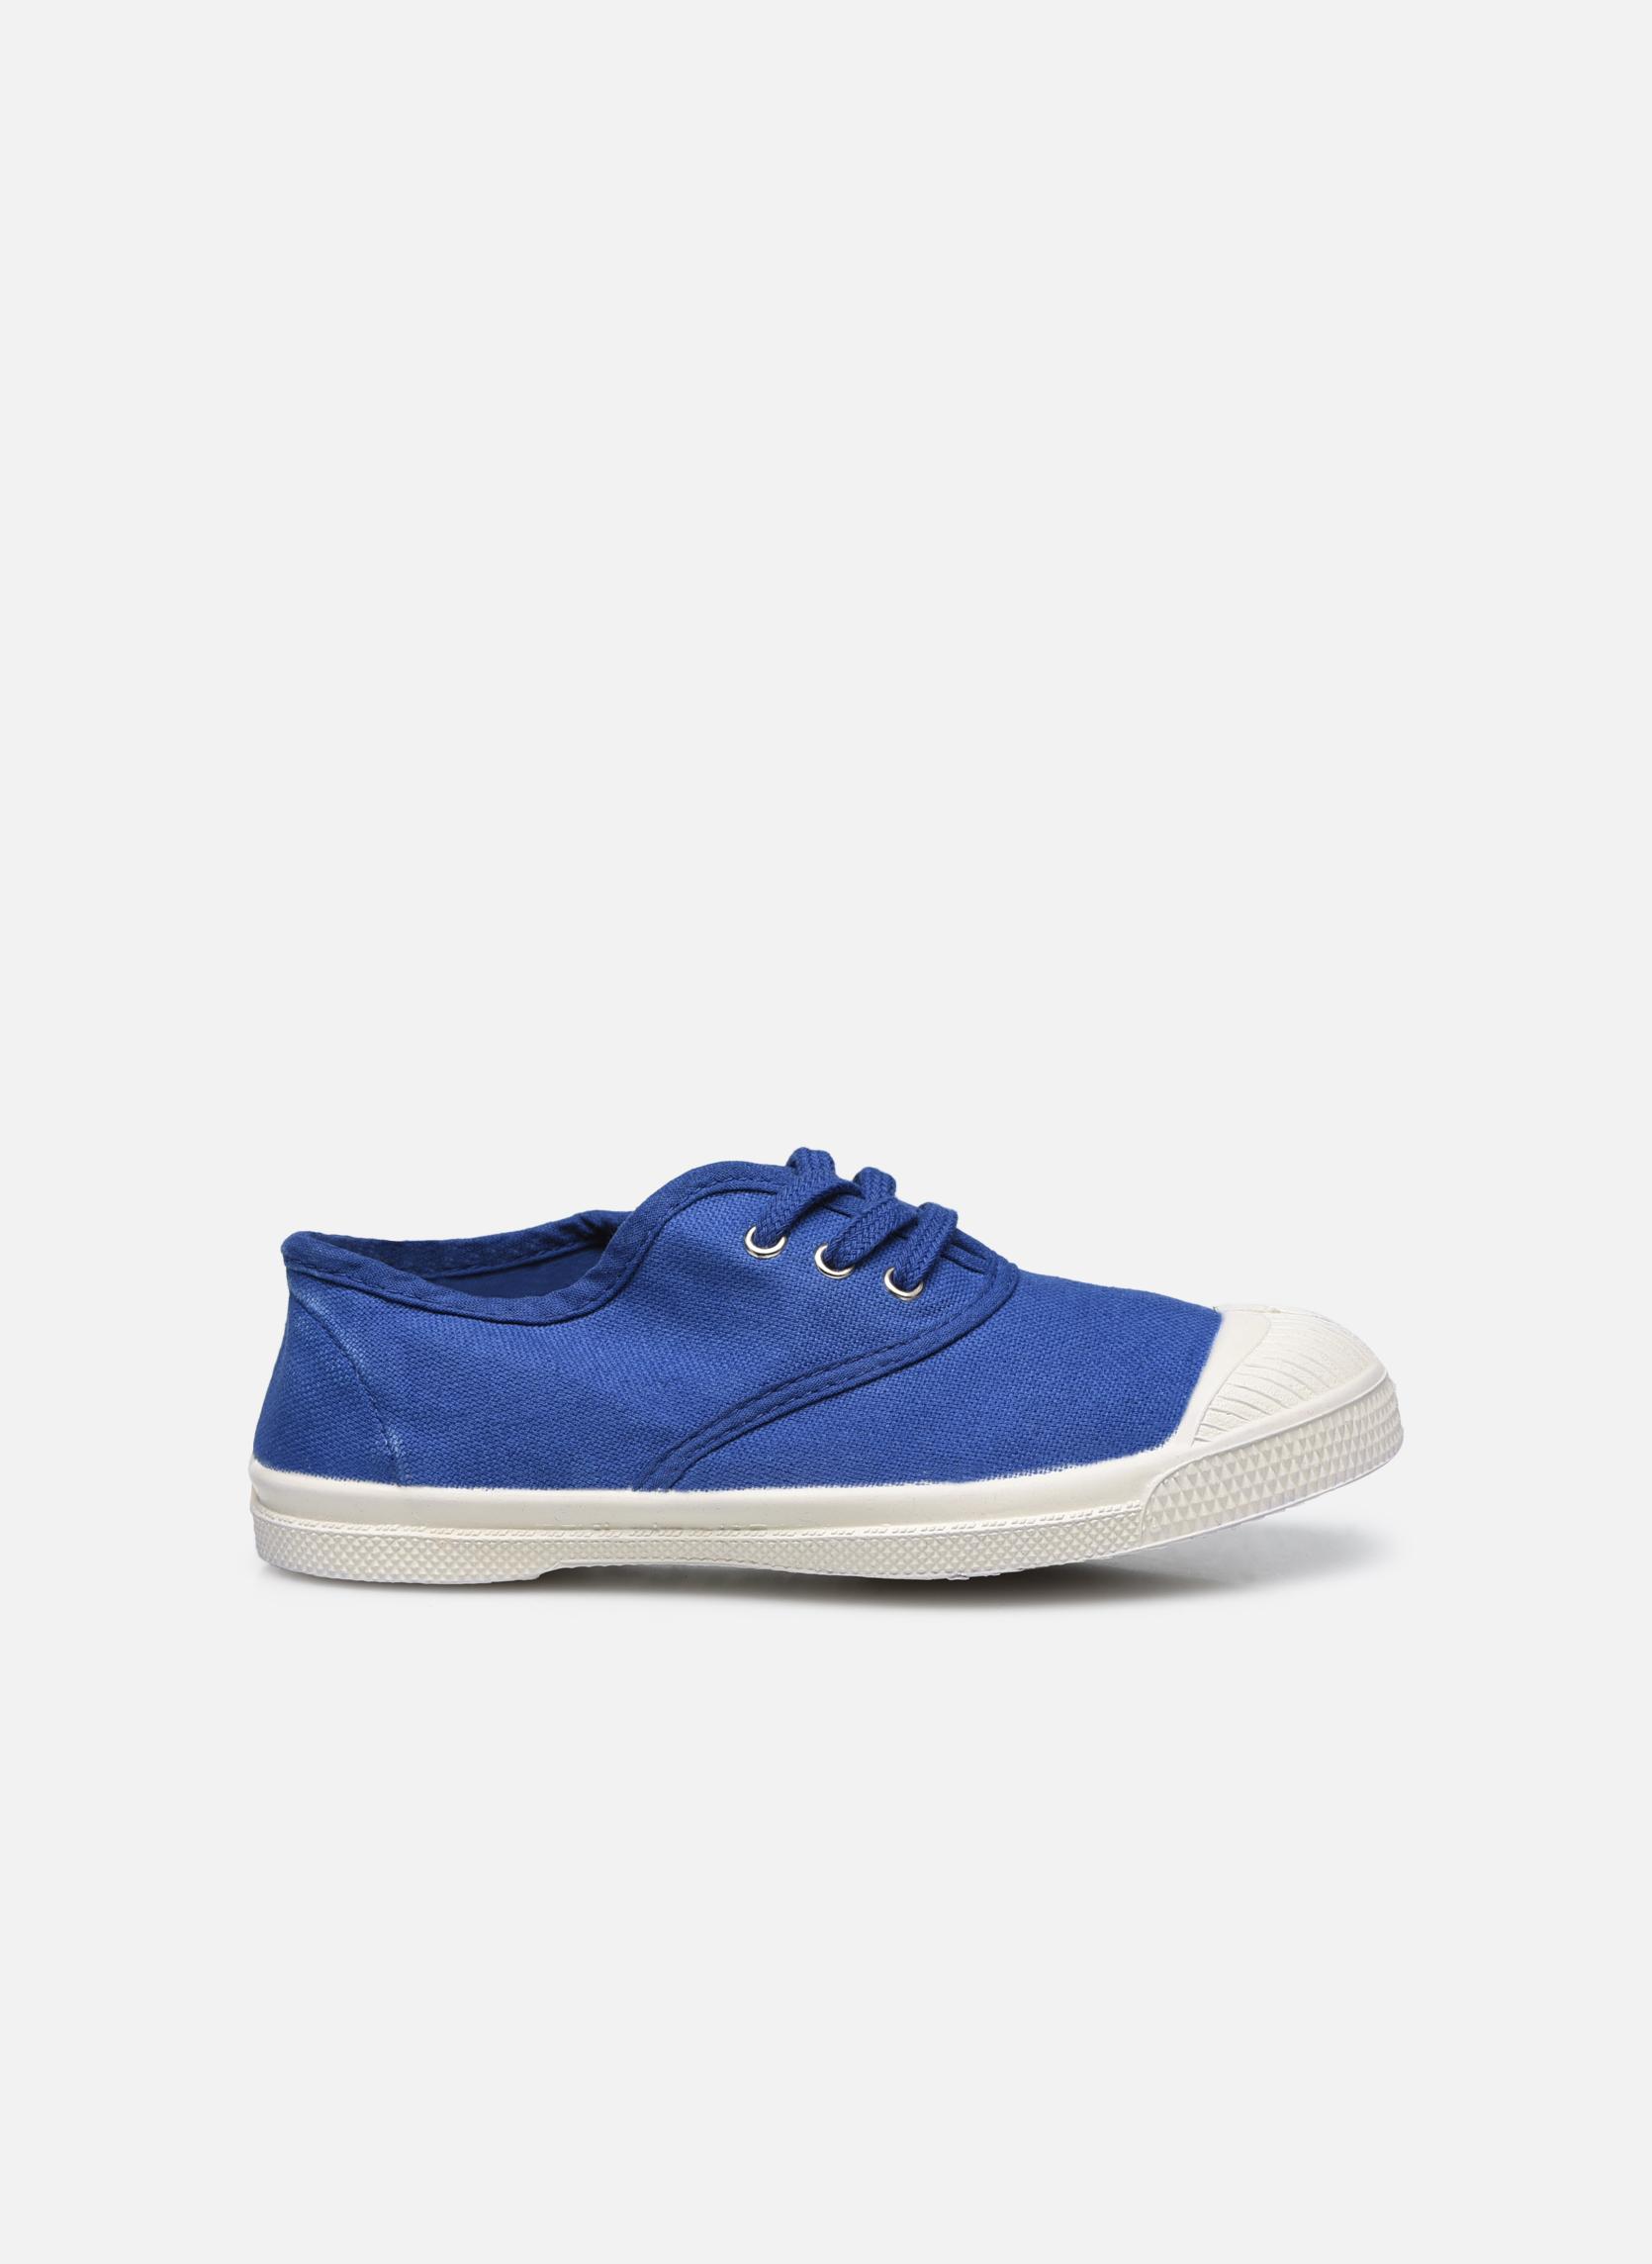 Tennis Lacets E Bleu Vif